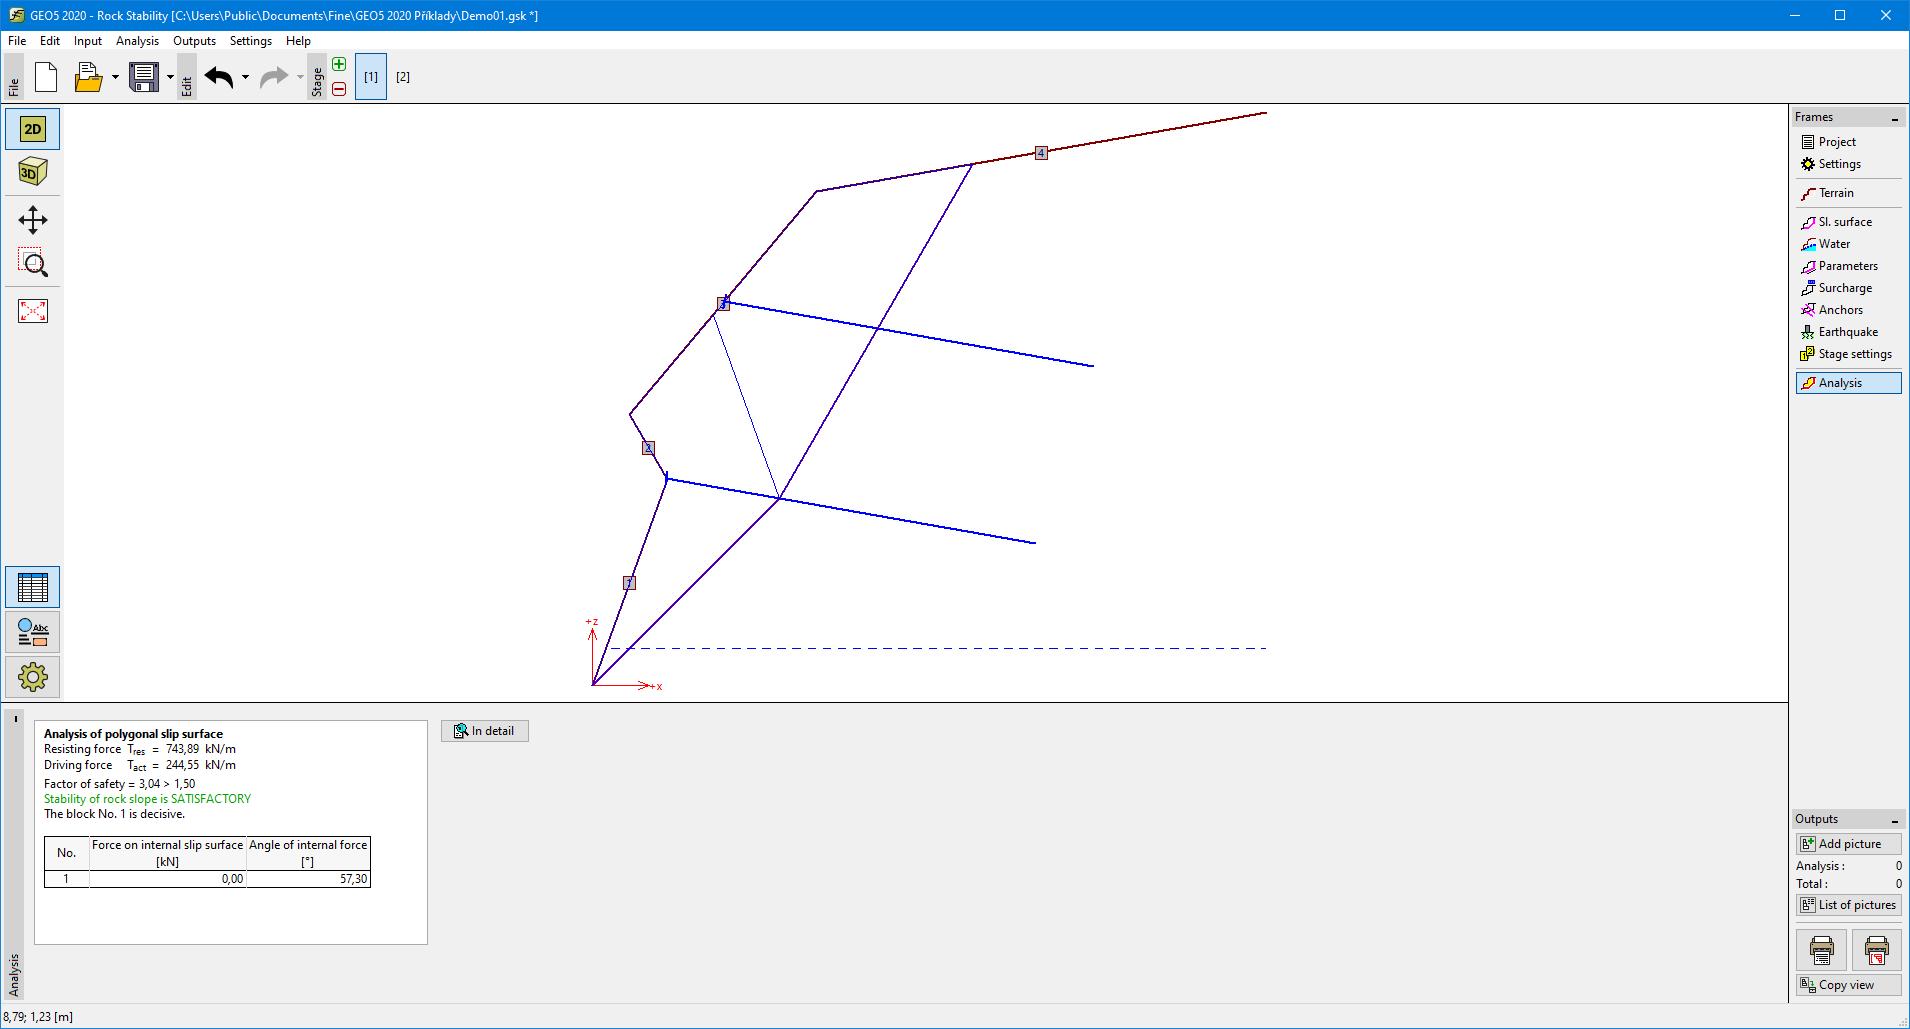 Analysis - Polygonal Slip Surface | Program Rock Stability